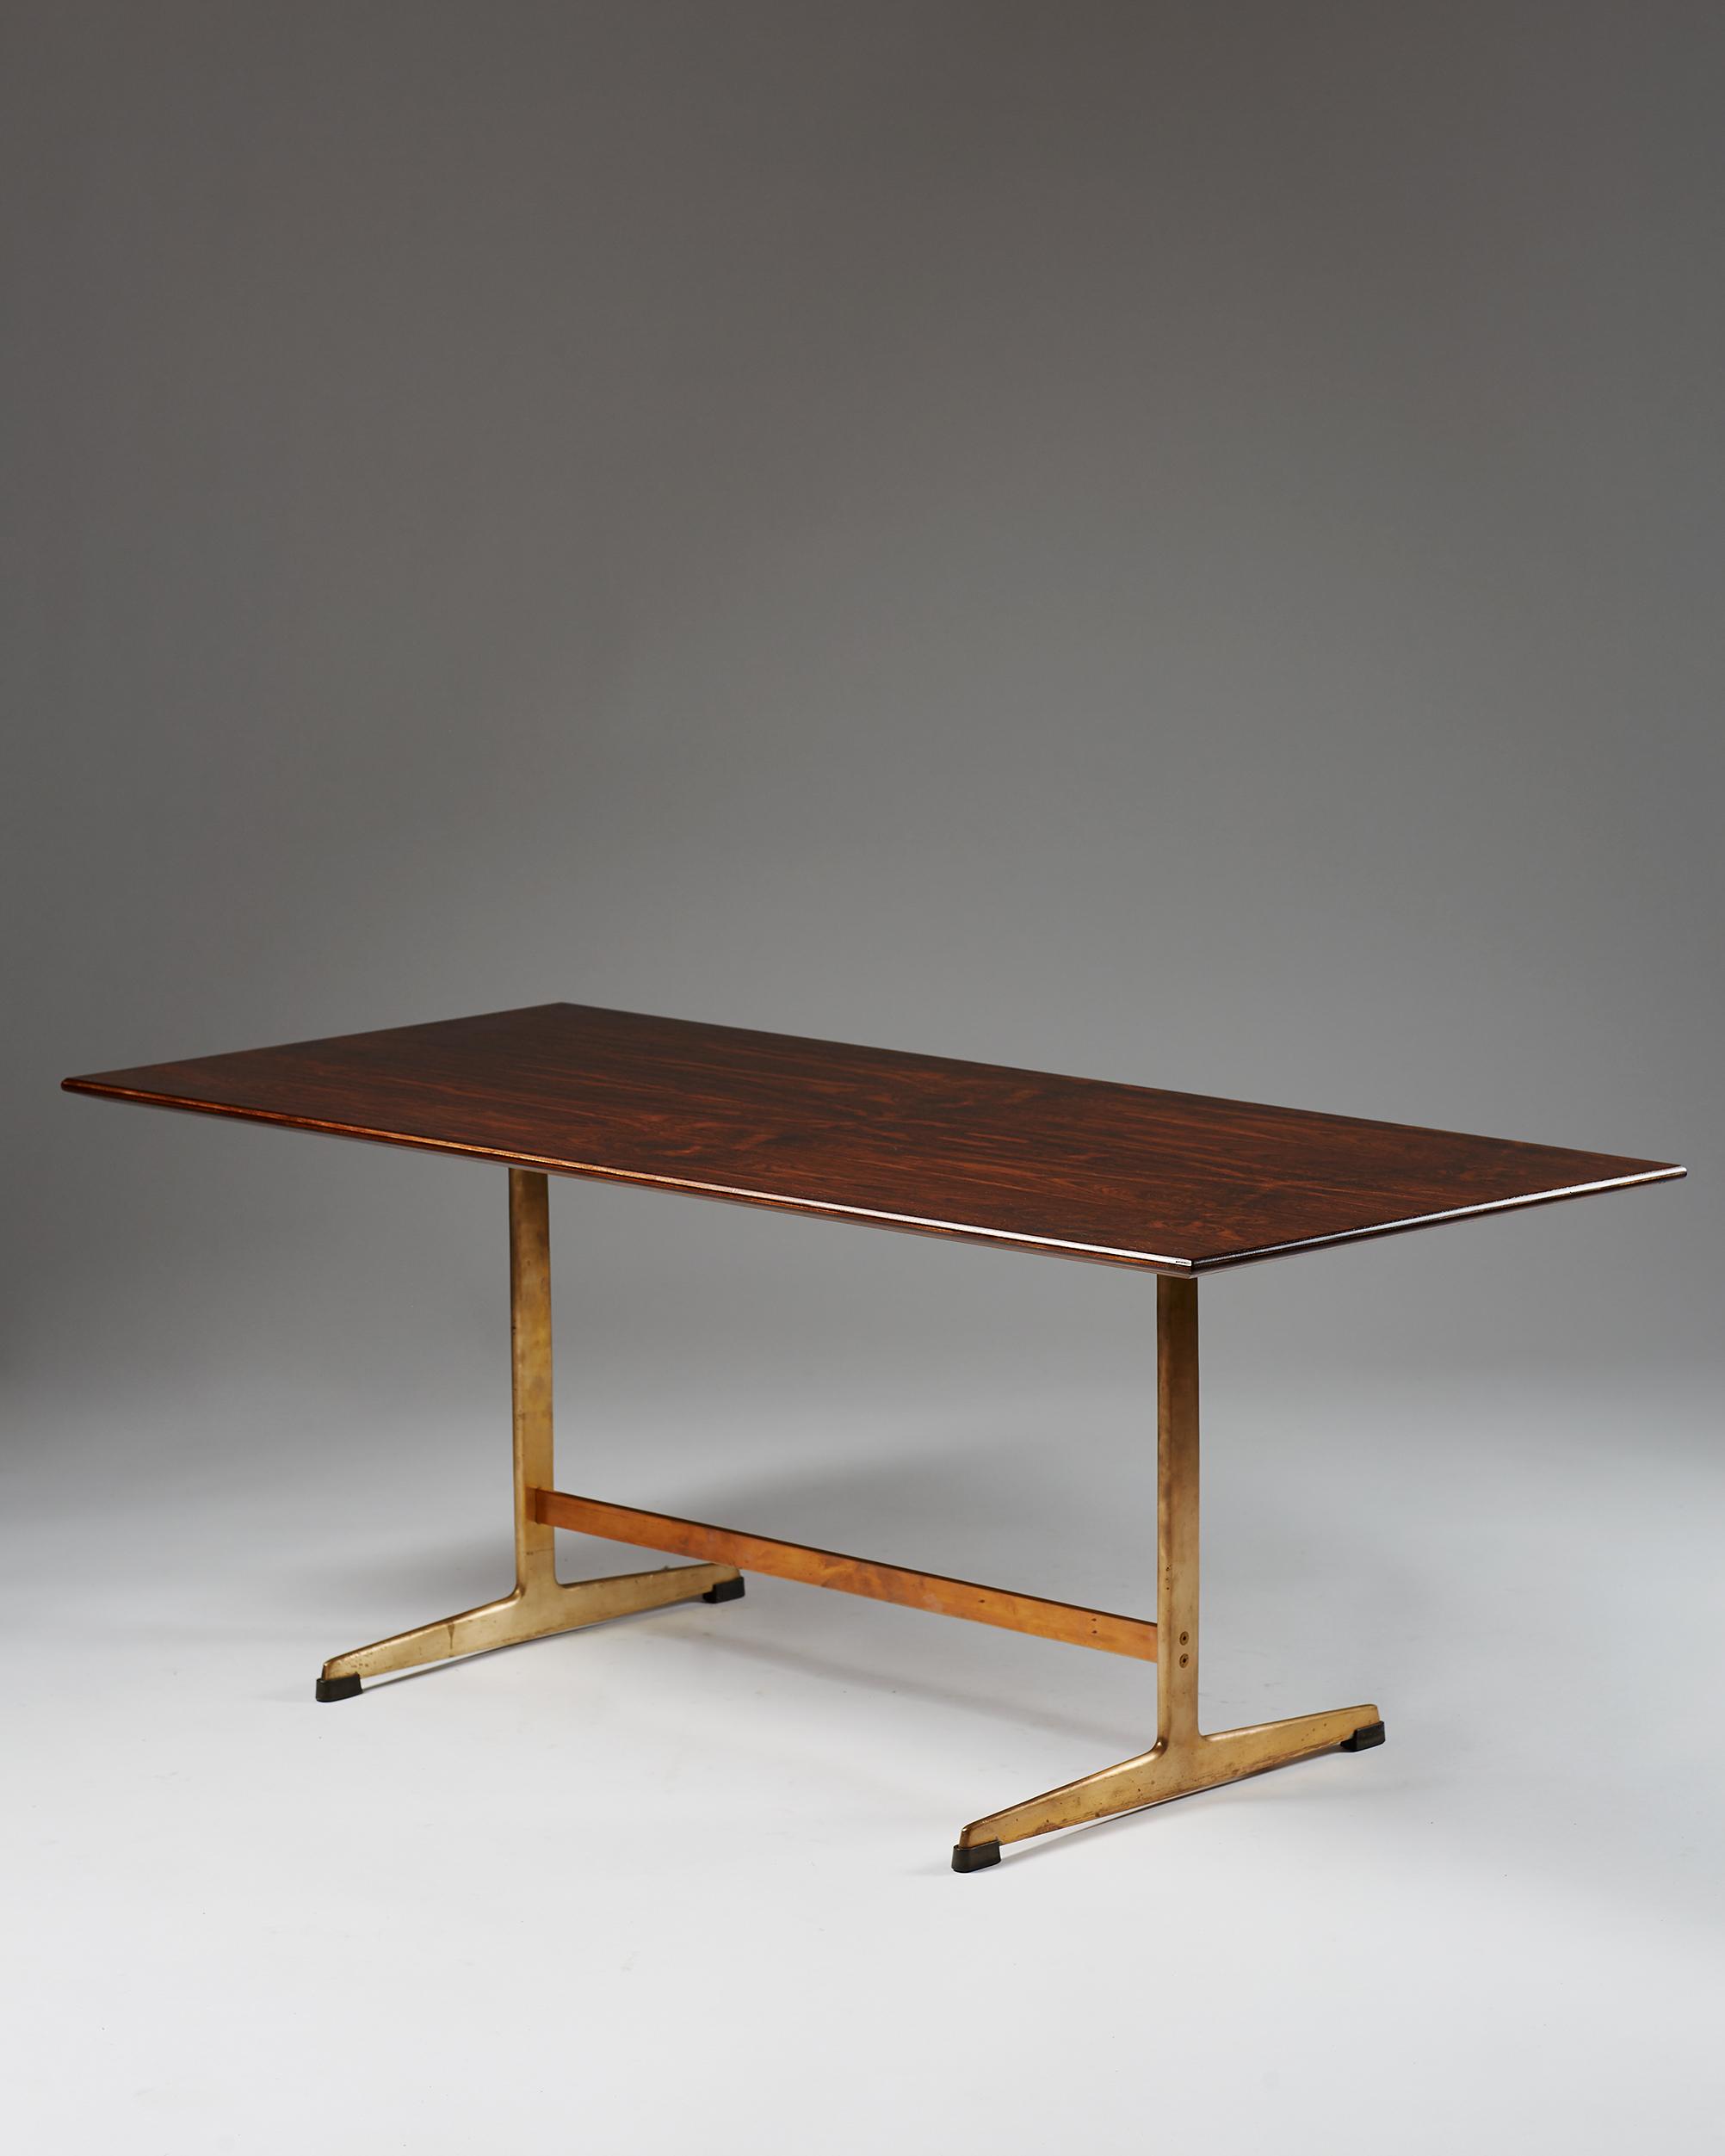 Arne Jacobsen  Coffee table Denmark, 1950's Bronze and rosewood. 47 x 120 x 55 cm